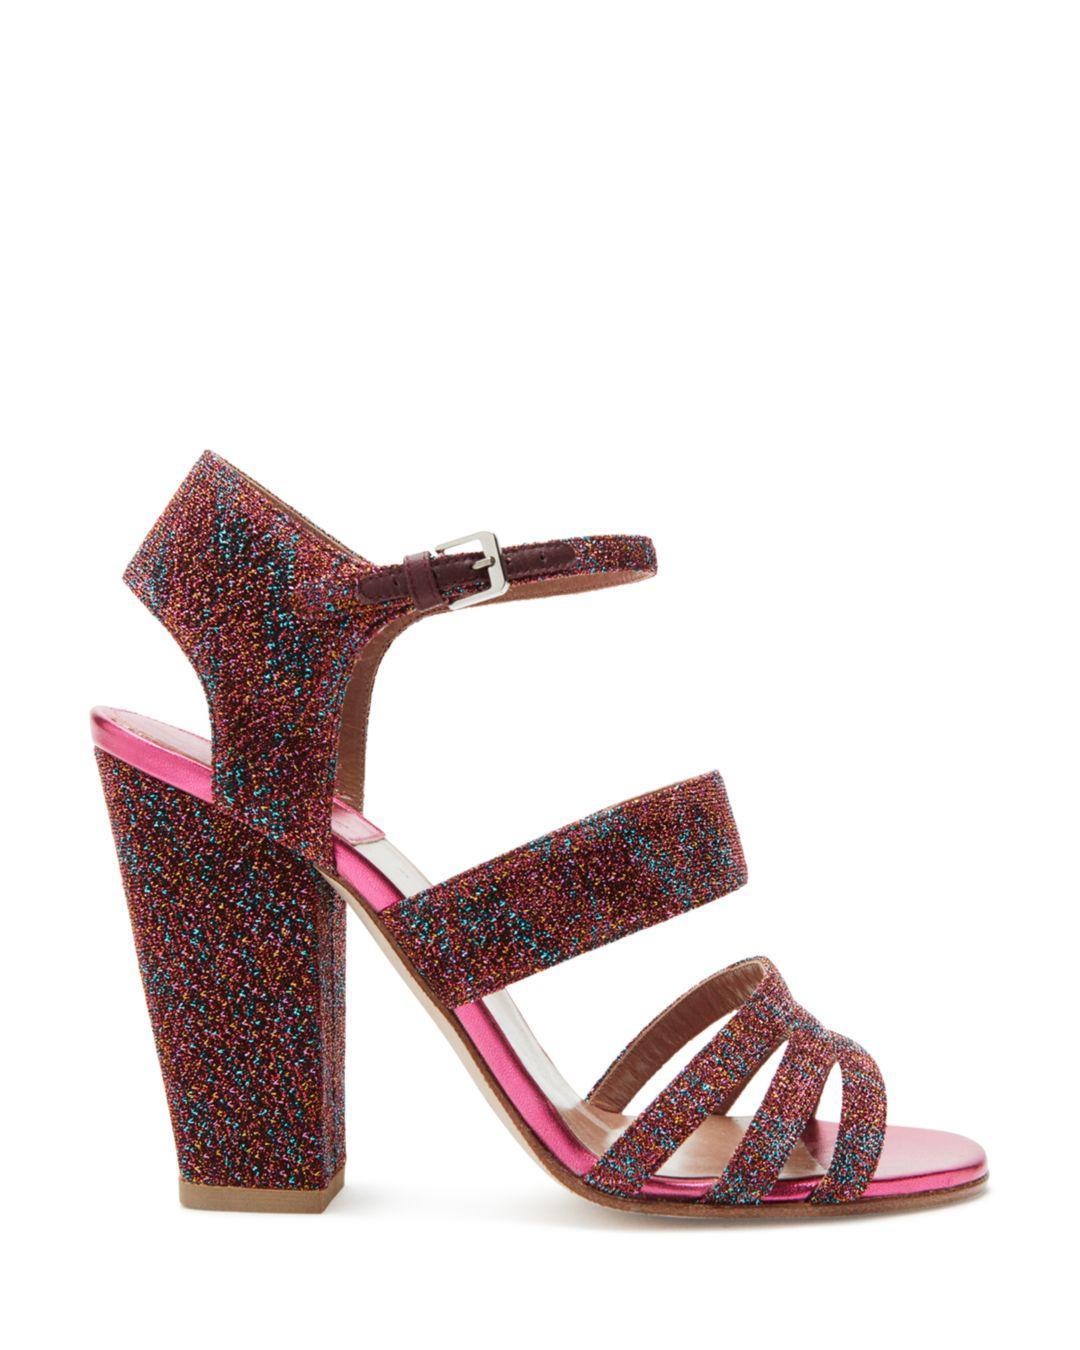 9174d6a85dec7 Lyst - Laurence Dacade Women s Ninon Multicolor Metallic Ankle Strap Sandals